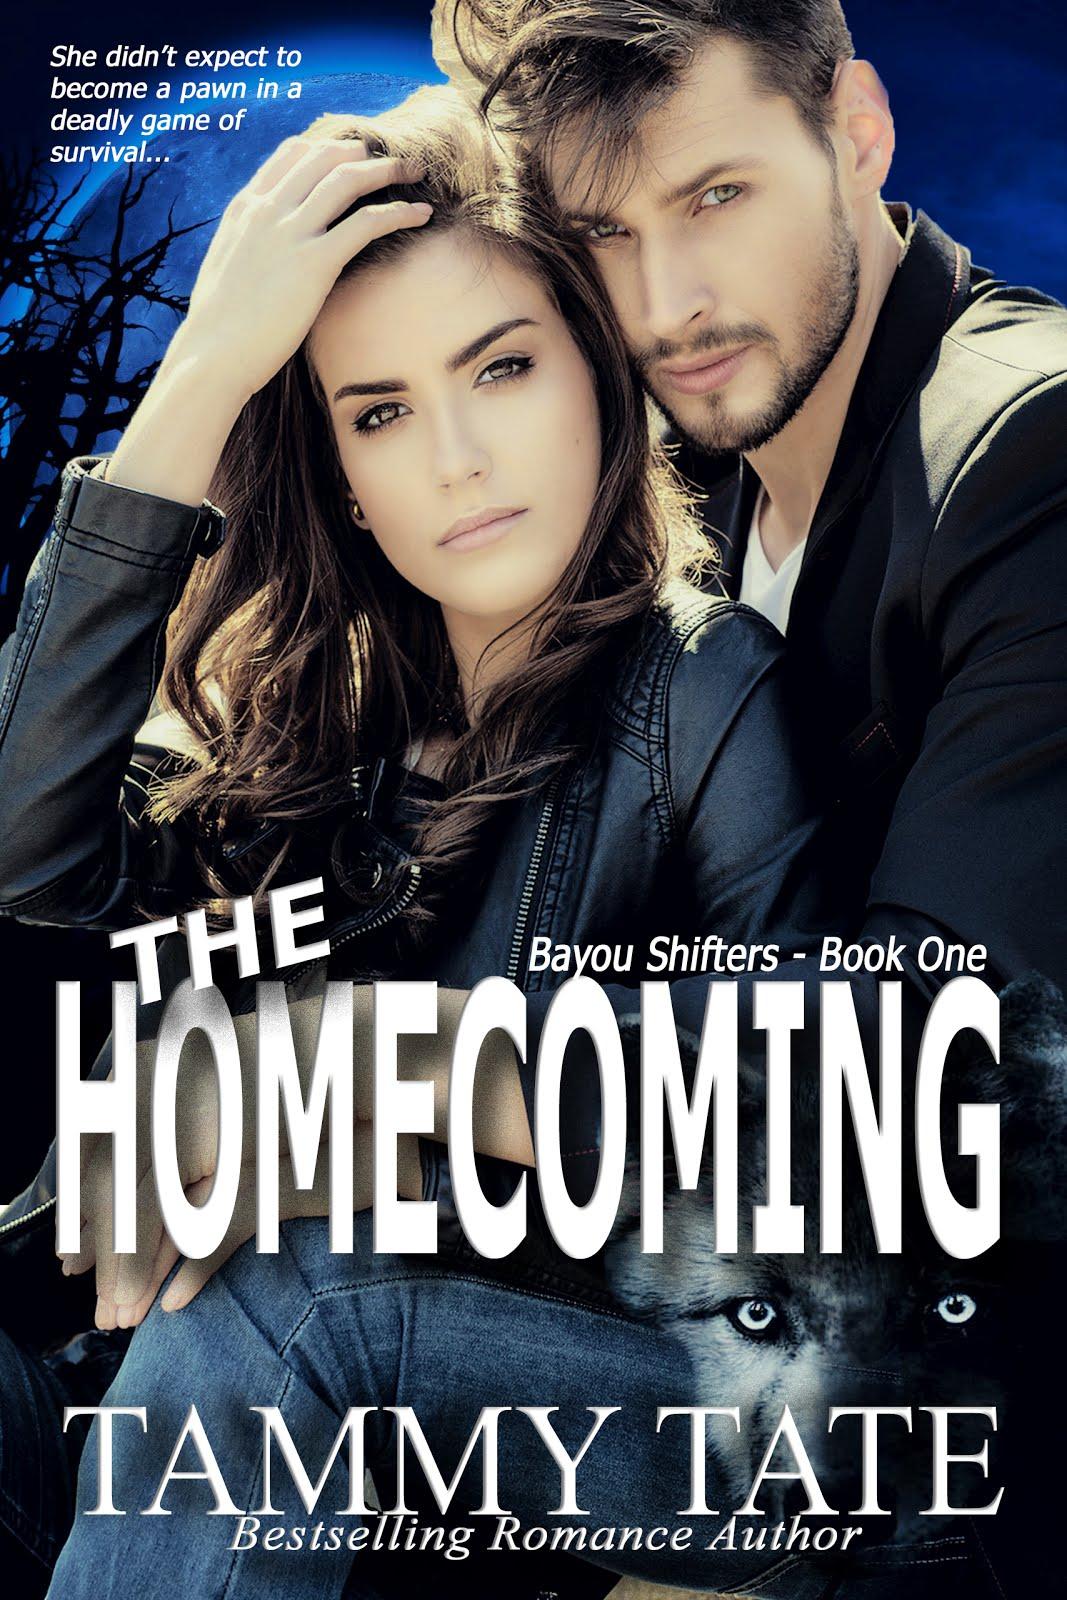 The Homecoming (Bayou Shifters - Book 1) Paranormal Romance